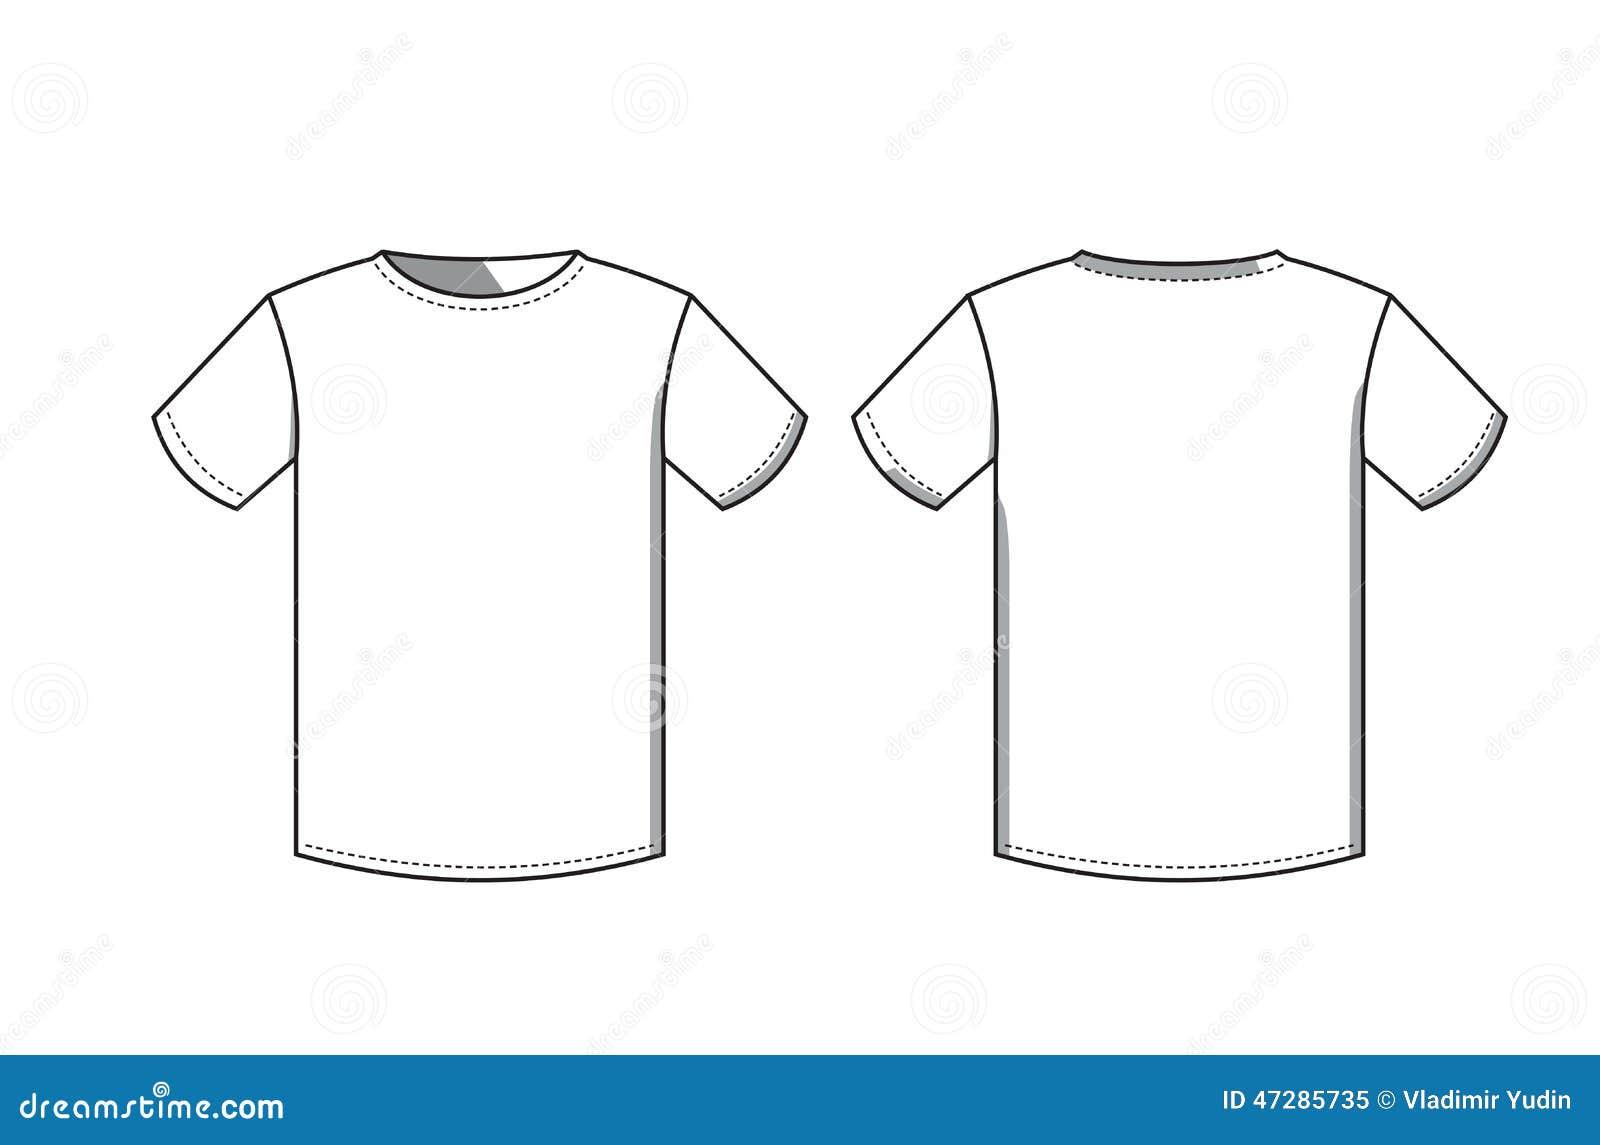 T Shirt Design Photoshop